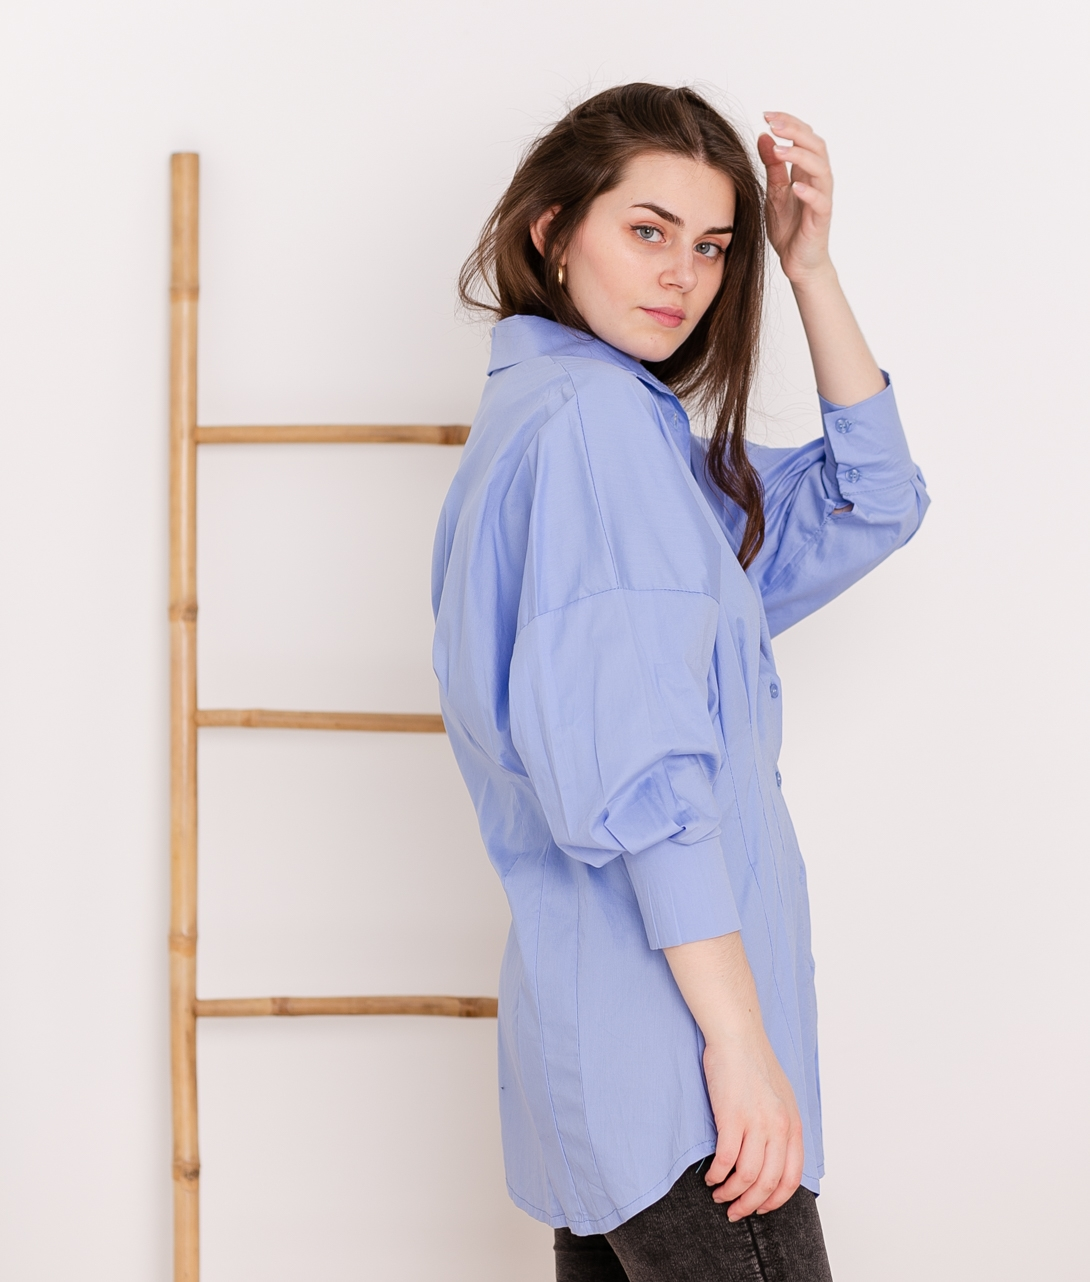 Blusa Onigumo - Azul